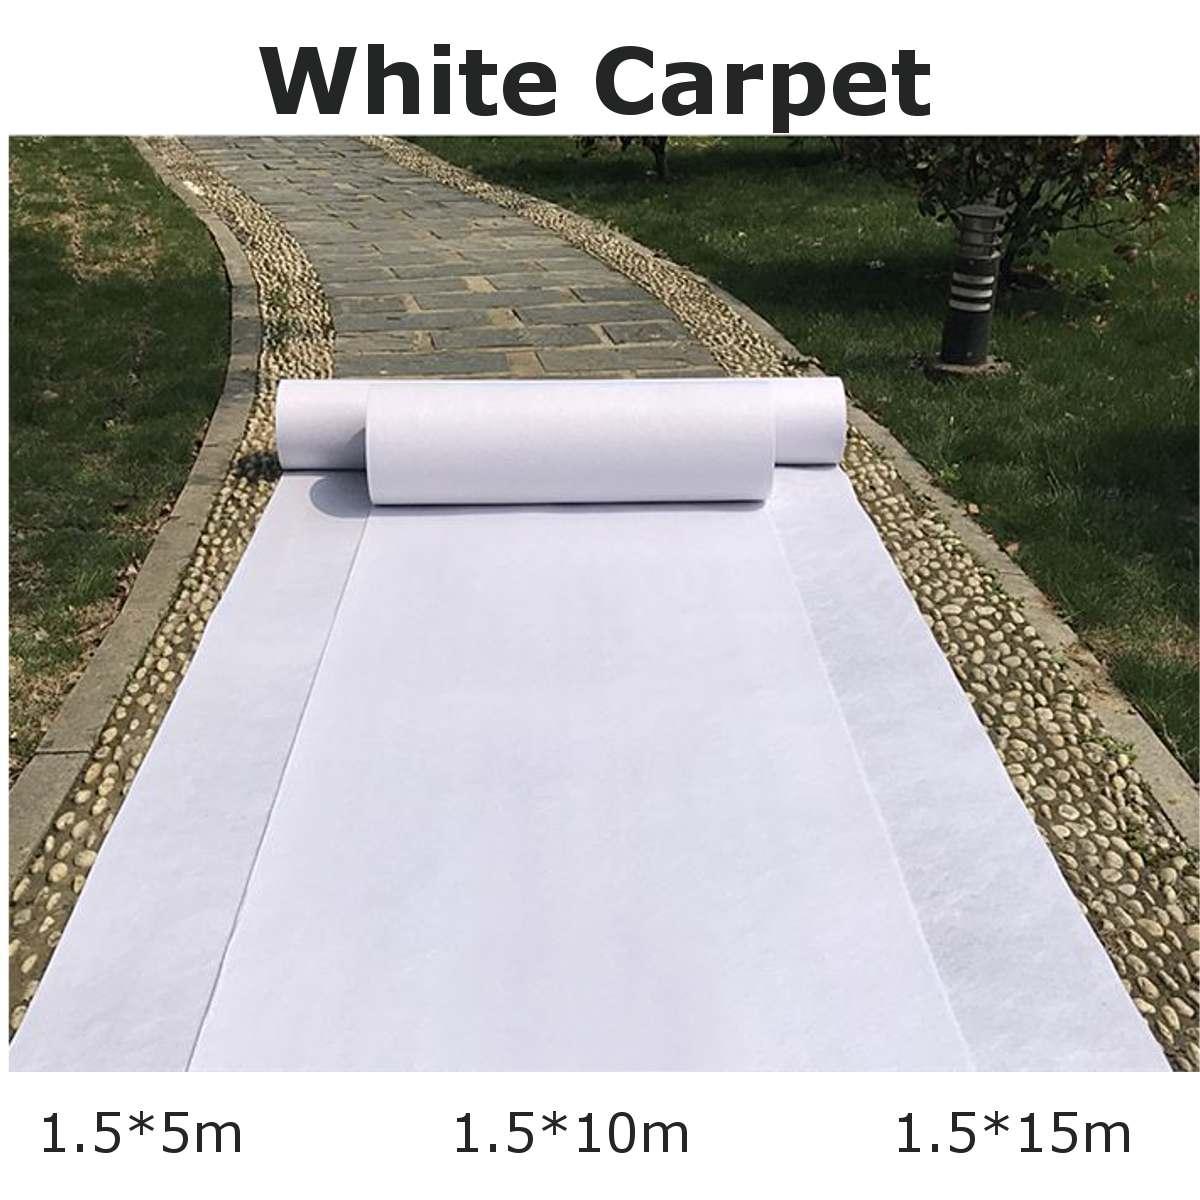 1.5x15/10/5m New Wedding Carpet White Carpet Aisle Runners Party  Banquet Celebration Film Festival Event Outddor Decor Mat